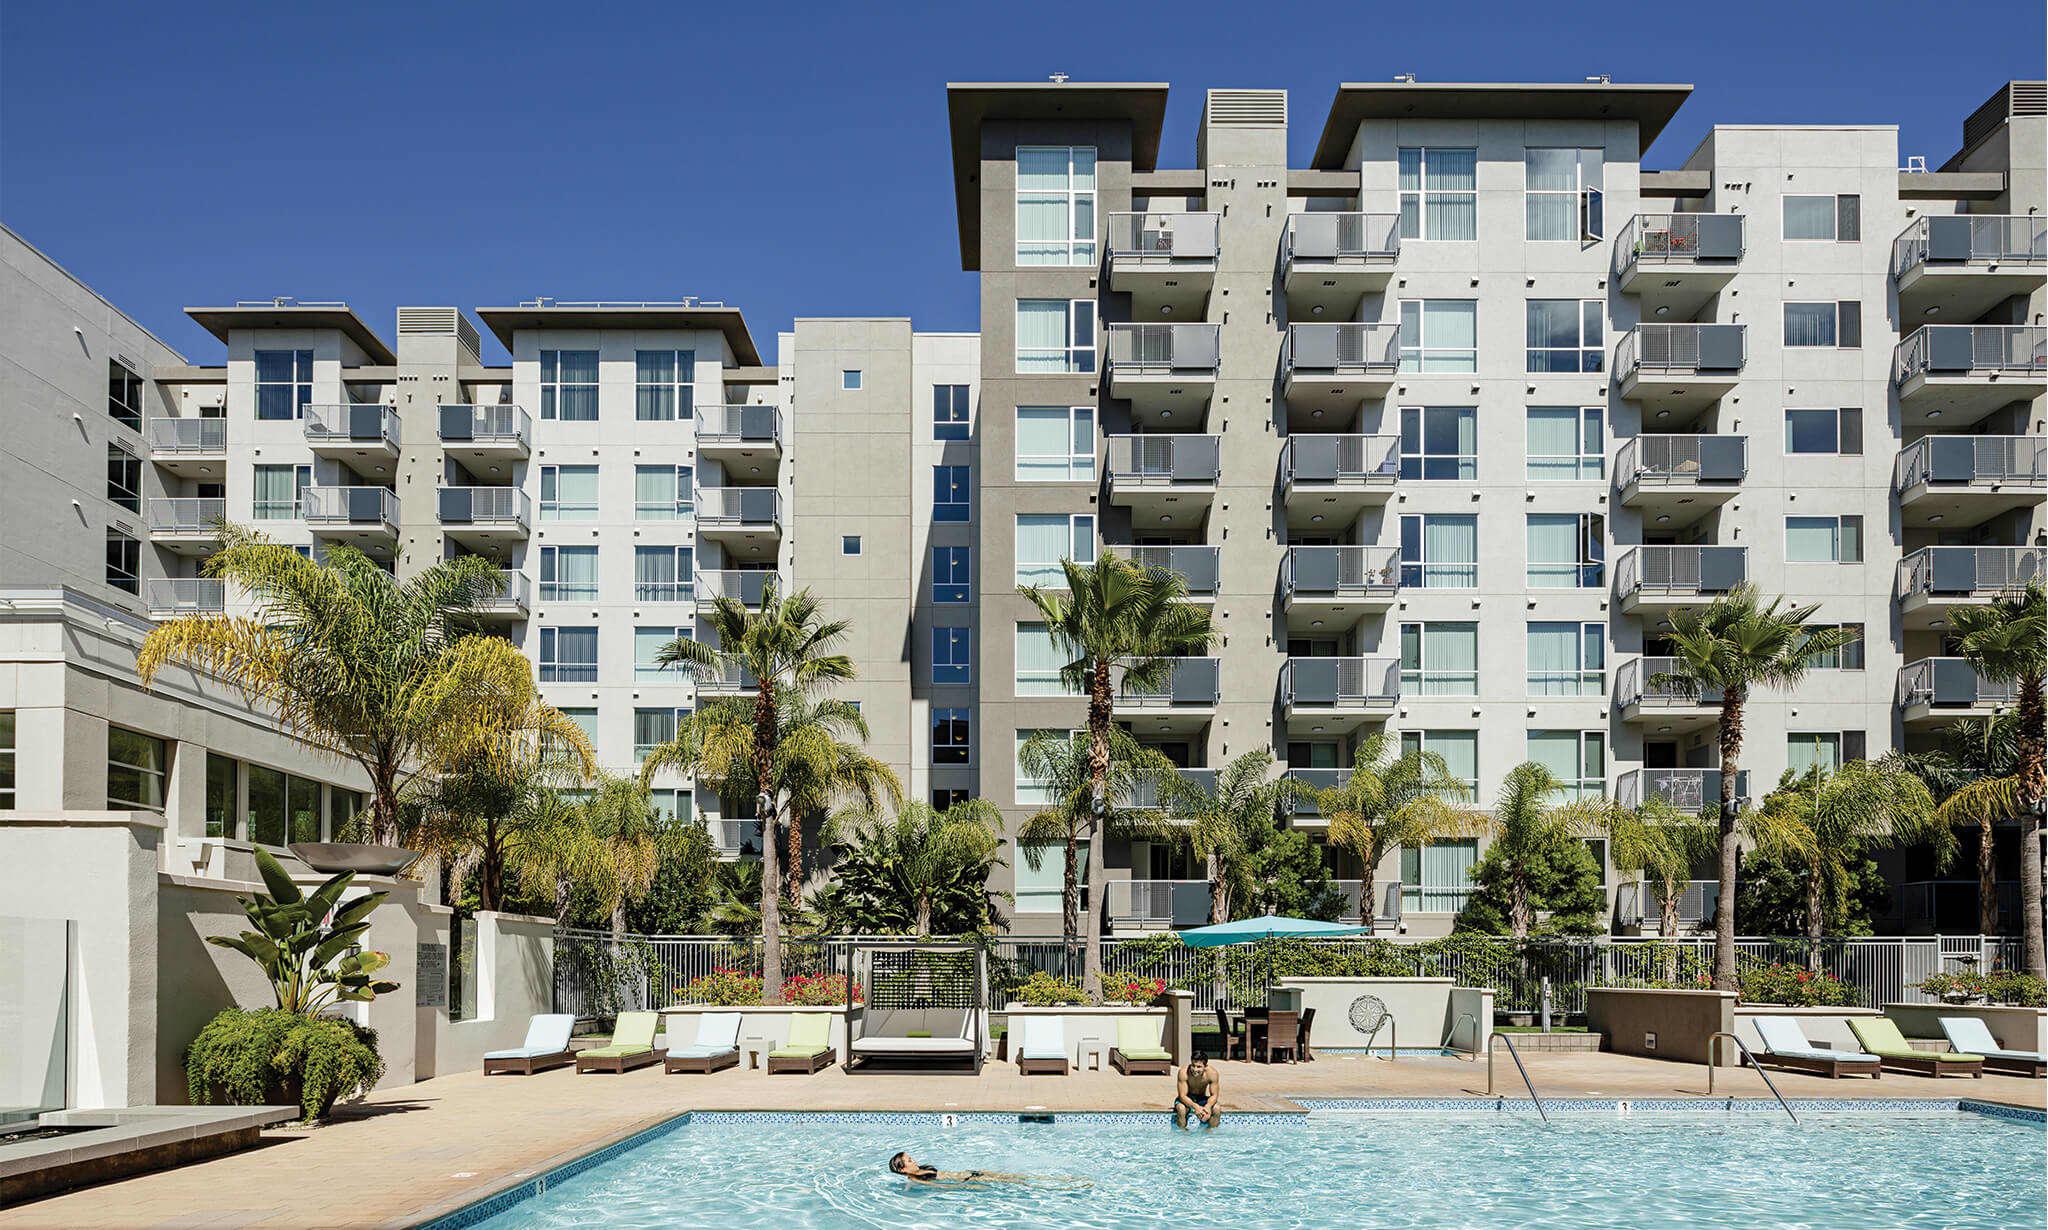 550 Moreland Apartments apartments in Santa Clara CA to rent photo 7